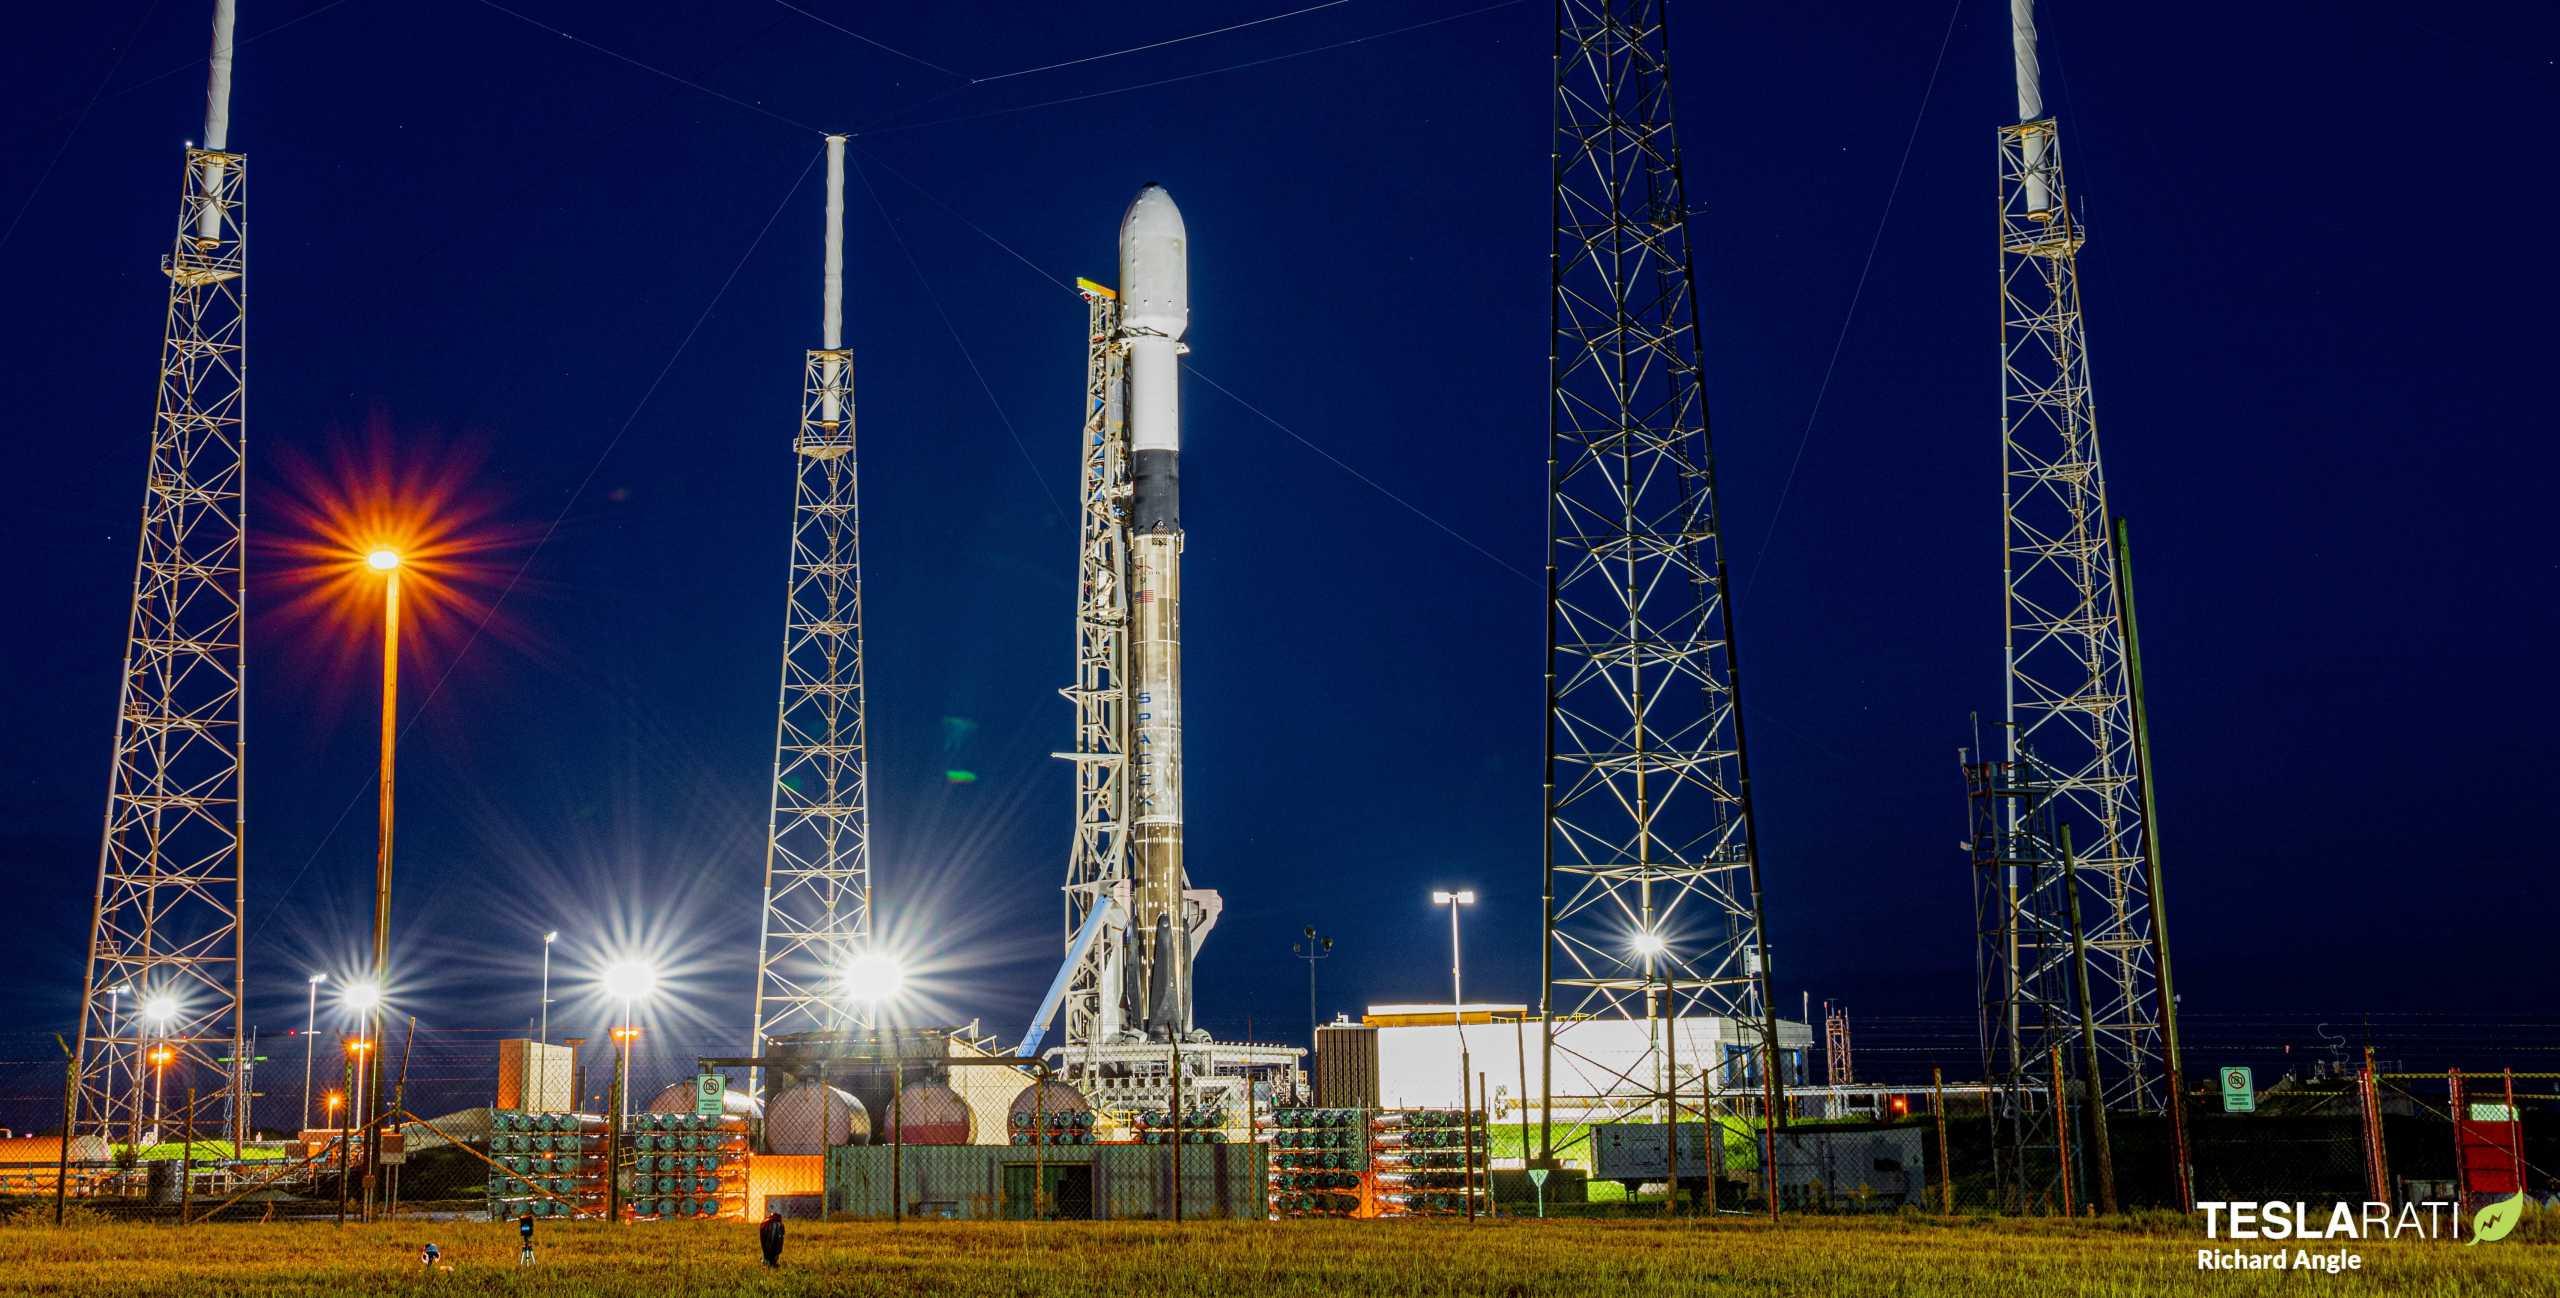 Starlink-10 SkySat Falcon 9 B1049 081820 (Richard Angle) LC-40 prelaunch 1 crop (c)